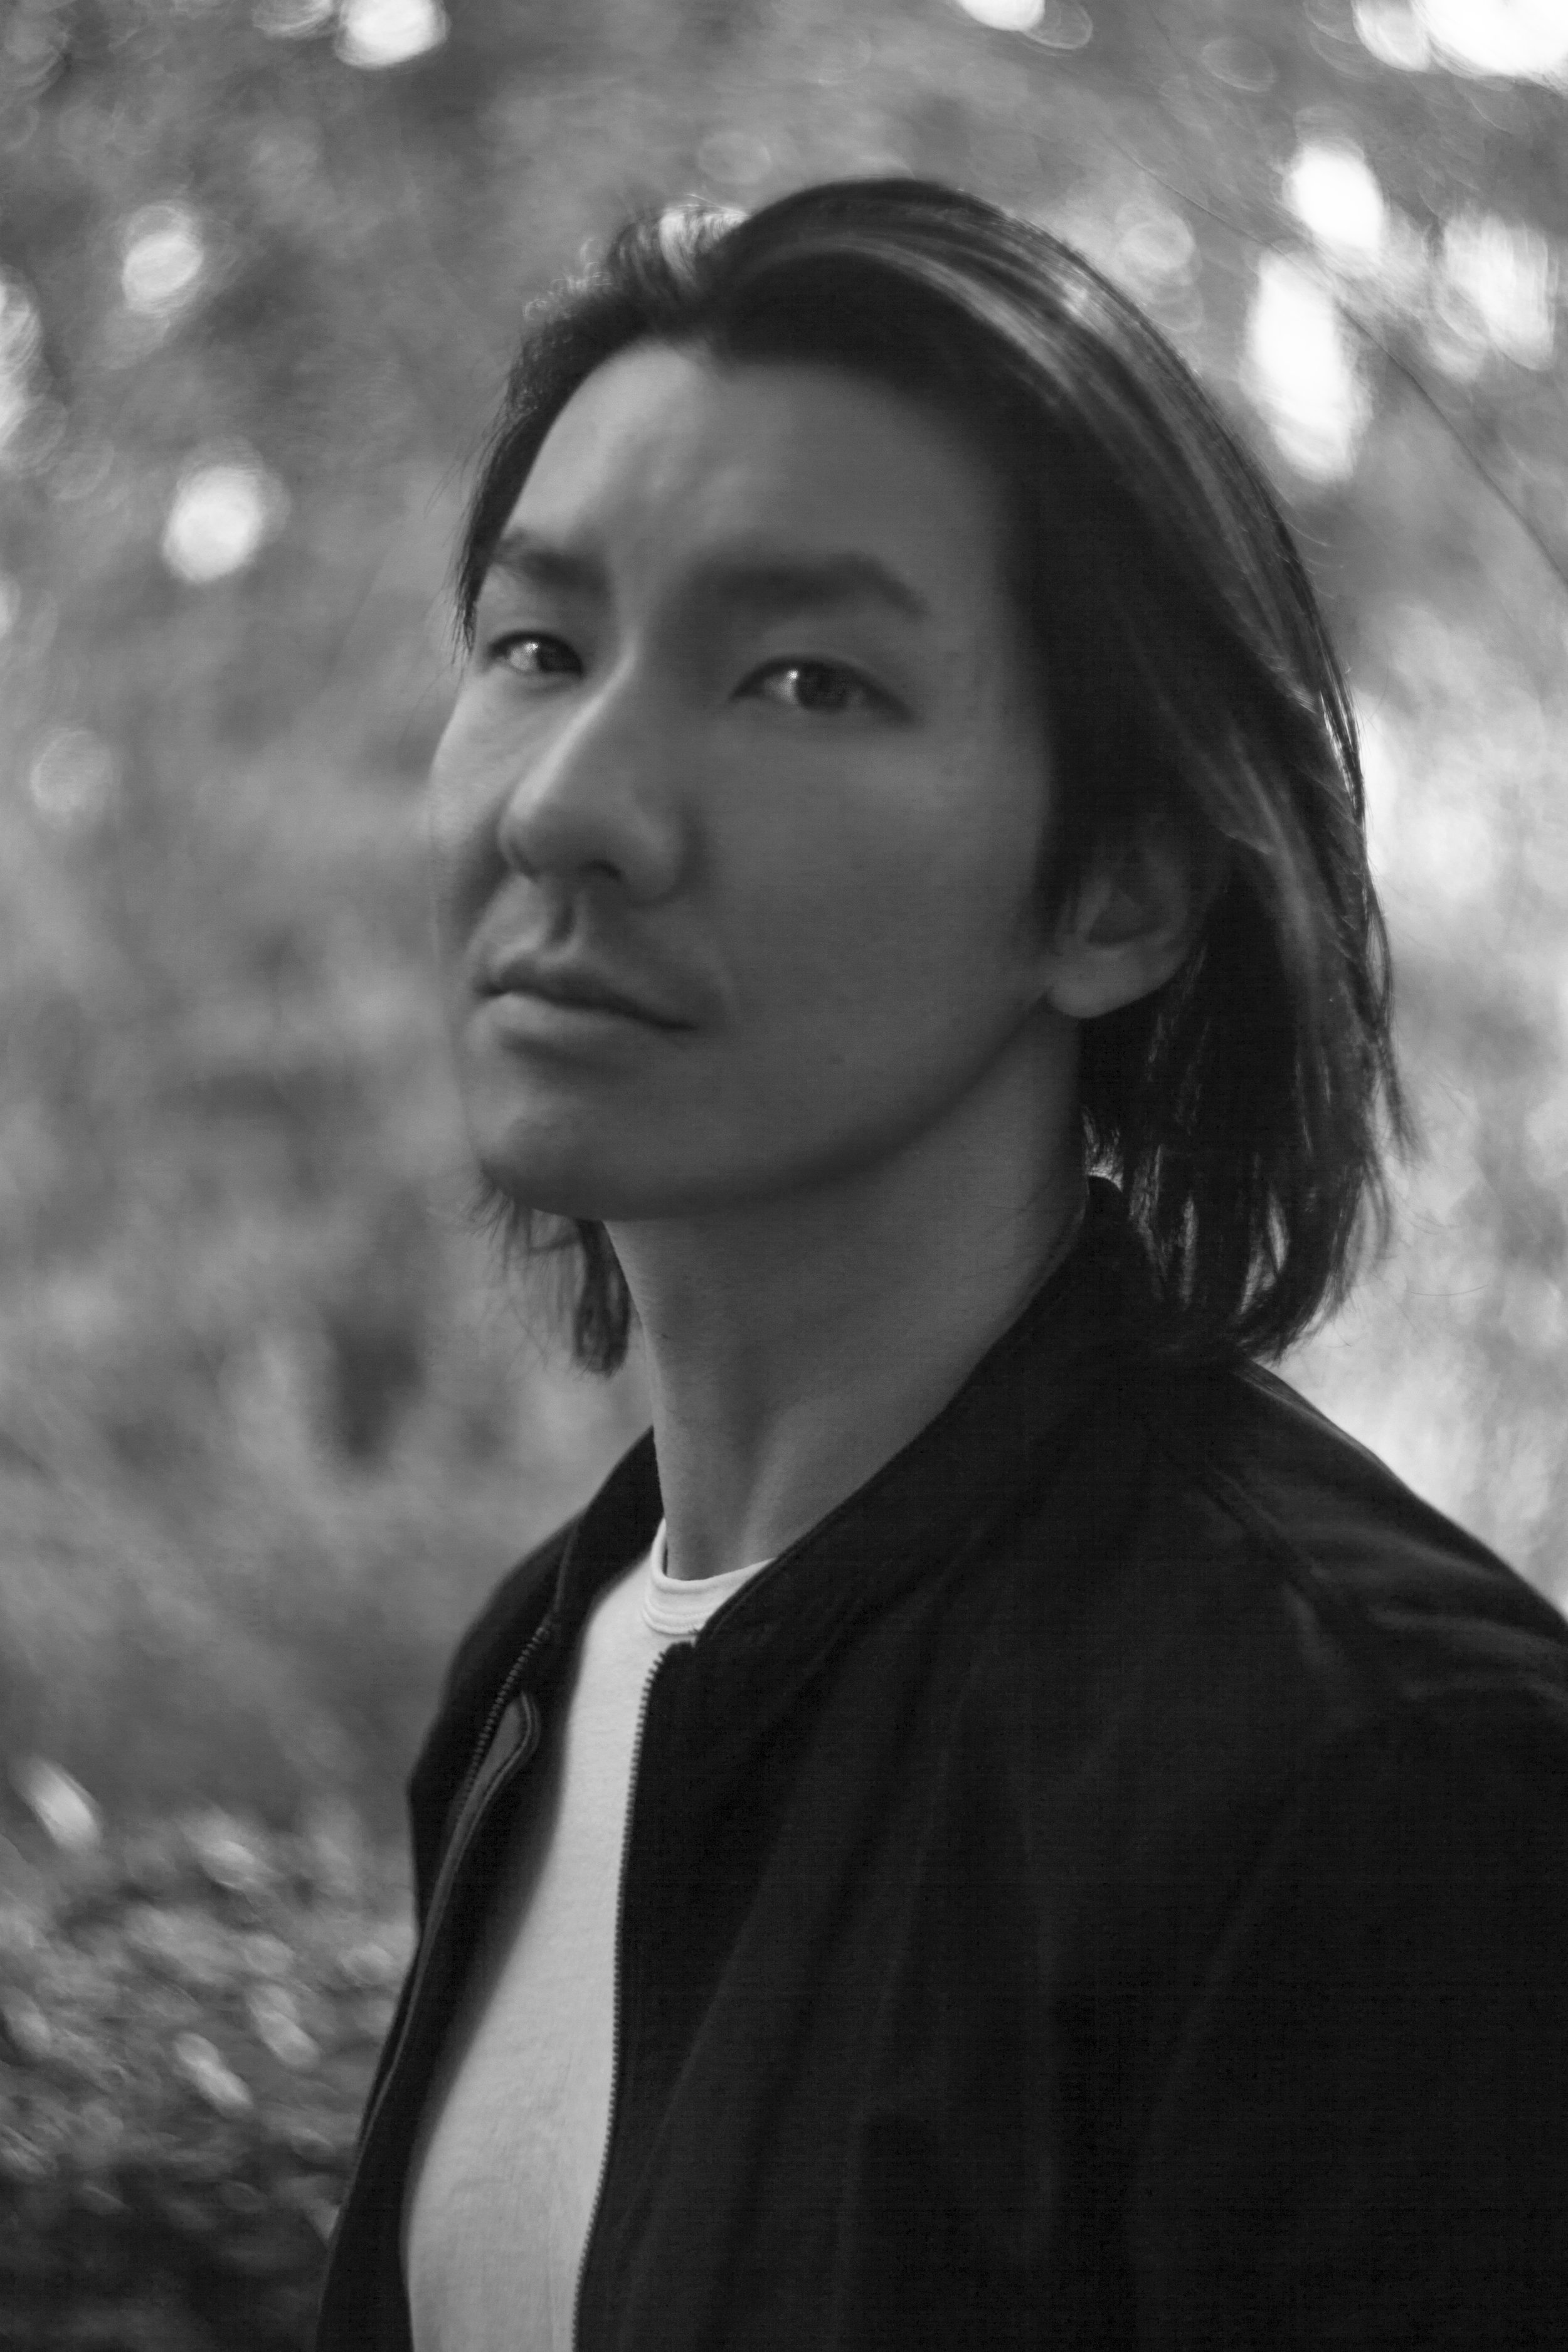 Andrew Hu (Moderator) - Andrew Hu, 美国华裔作家,导演。毕业于美国电影学院。 2015年获得David&Lynn Angell奖学金。2016年,其作品 The Black List入选年度电视作家人员编制书。Andrew Hu同时也为中国和德国的公司撰写电视和电影,作品曾在维也纳独立电影节和迈阿密电影节等电影节放映。